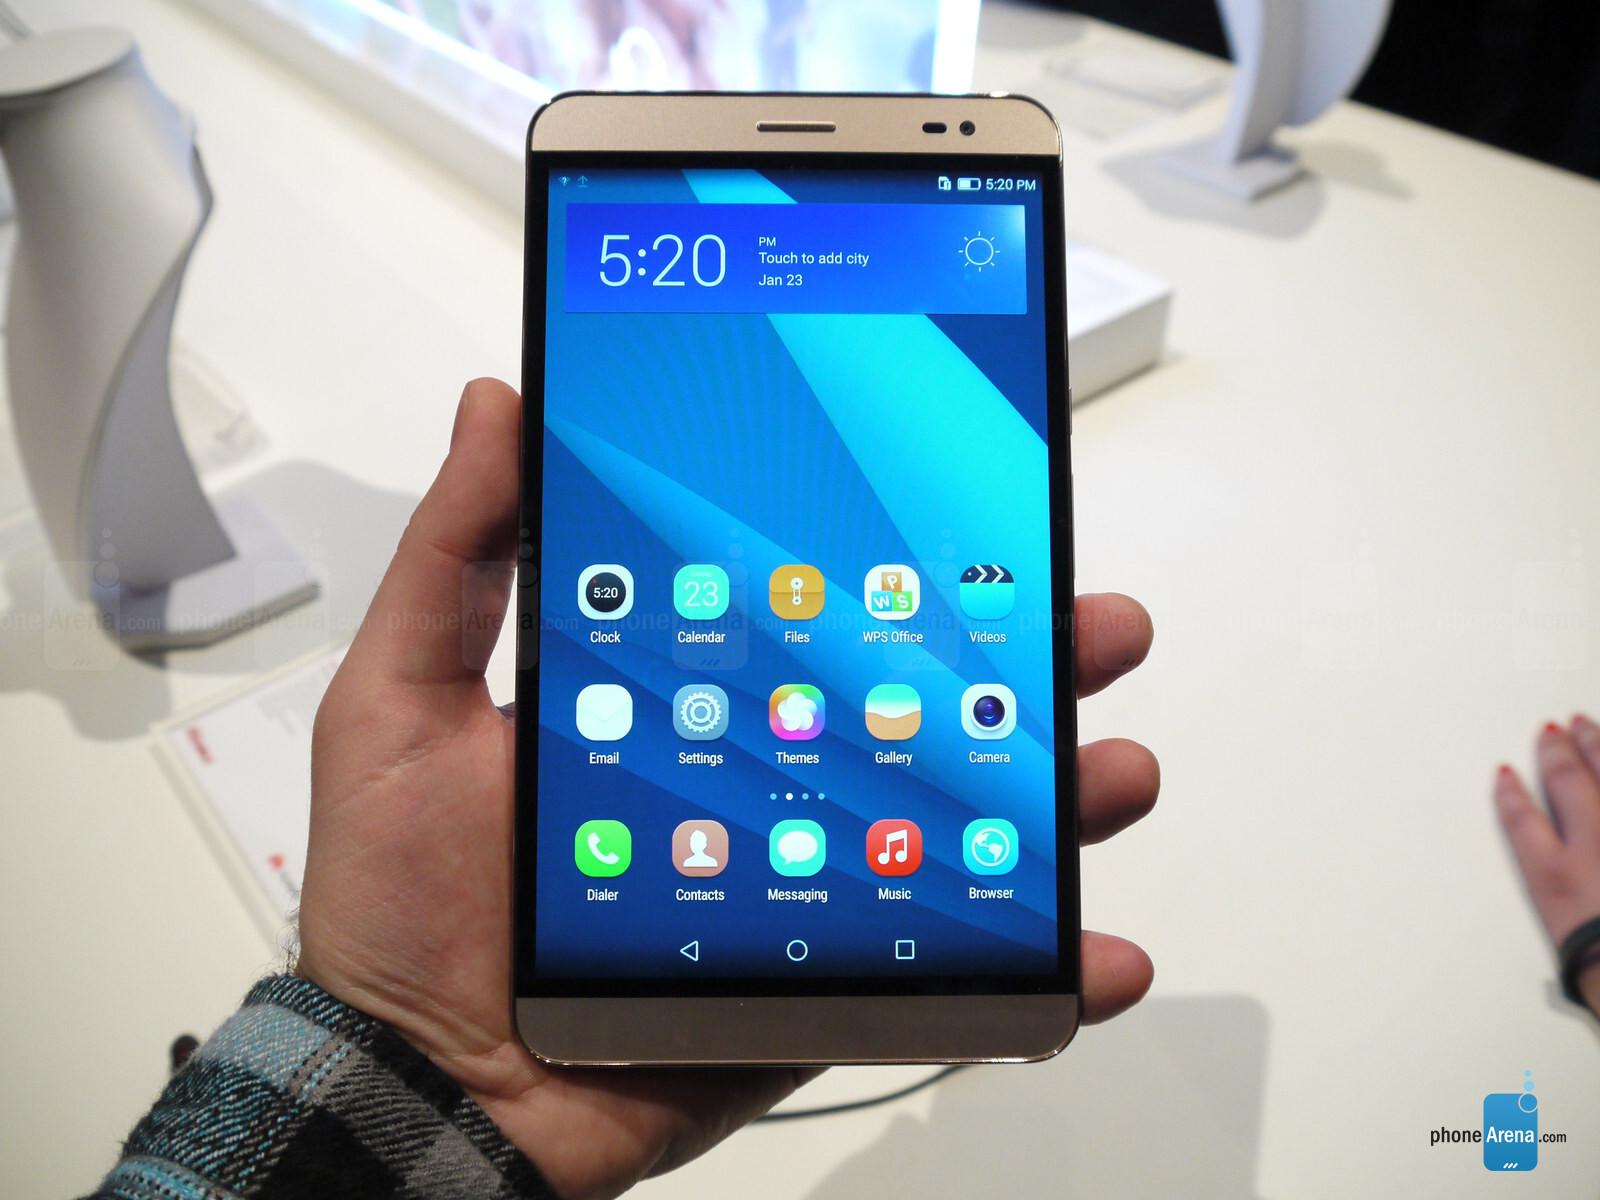 Huawei MediaPad X2 hands-on